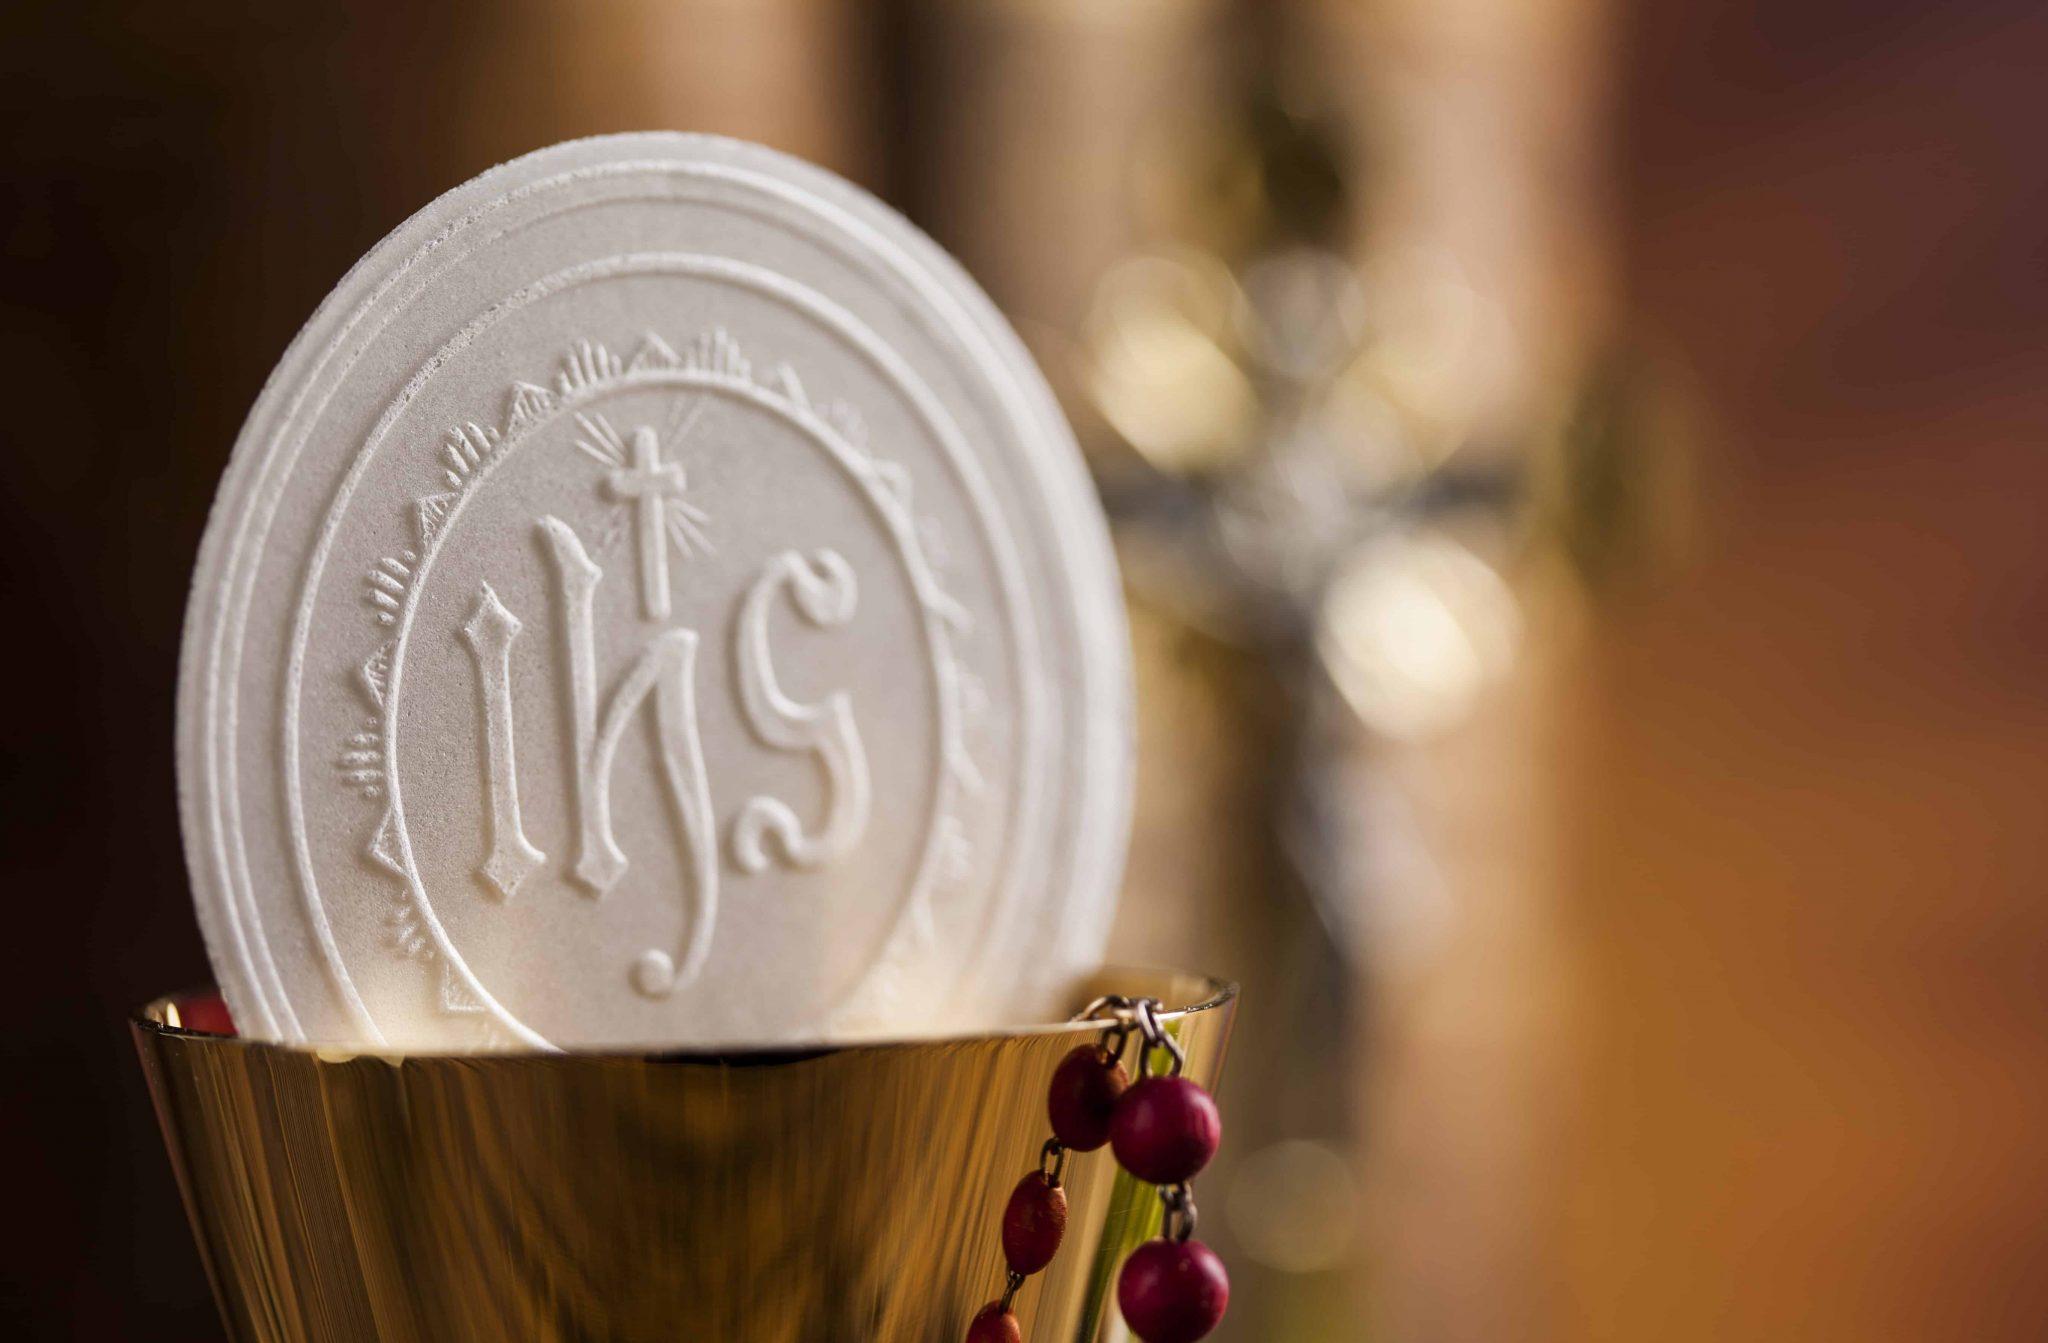 Eucharist (Holy Communion) – Saint Elizabeth Ann Seton